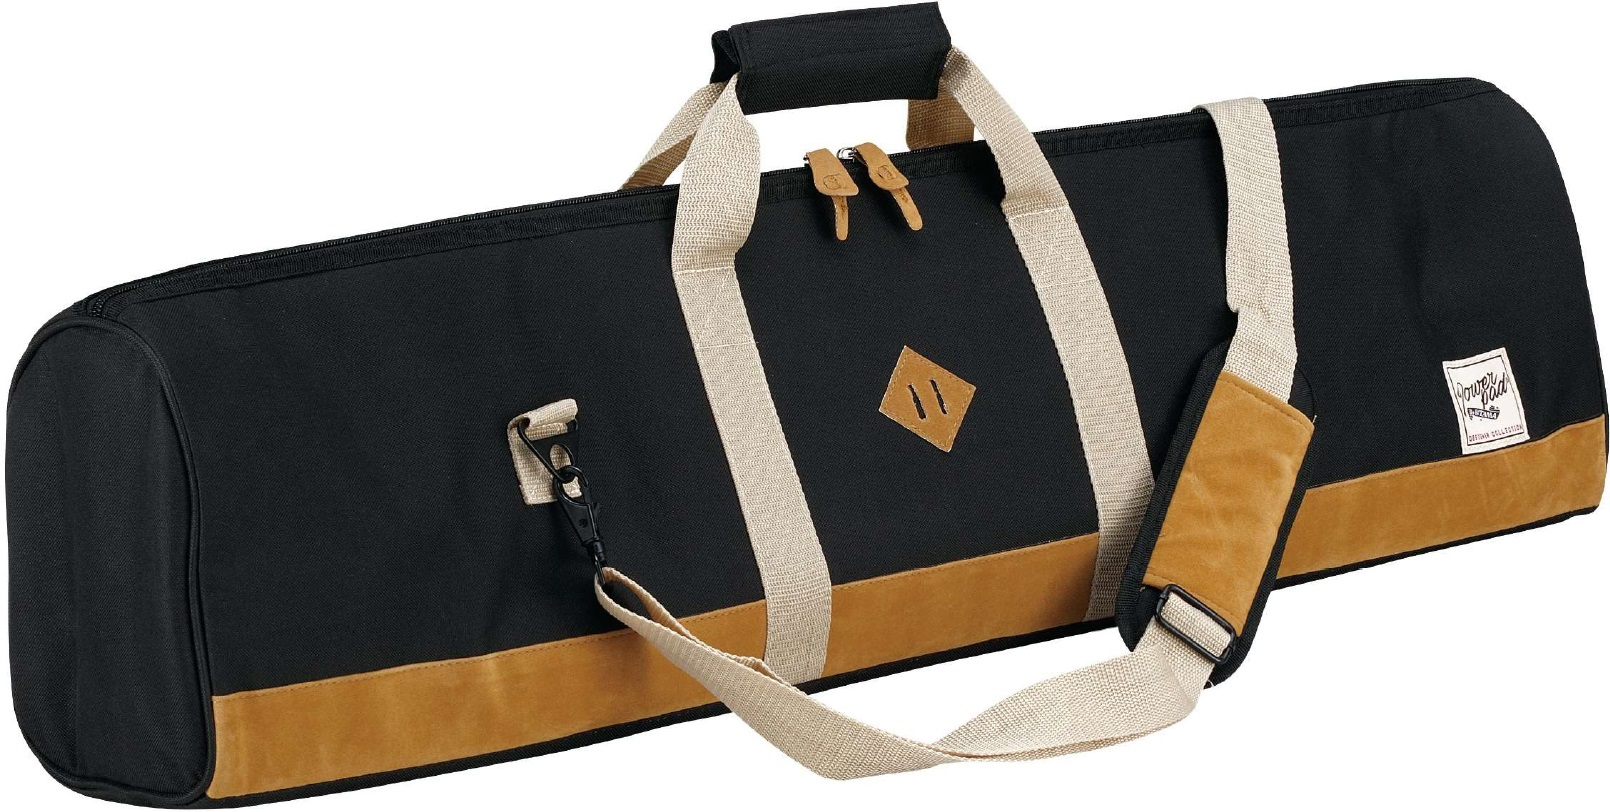 Tama Powerpad Designer Hardware Bag - Black